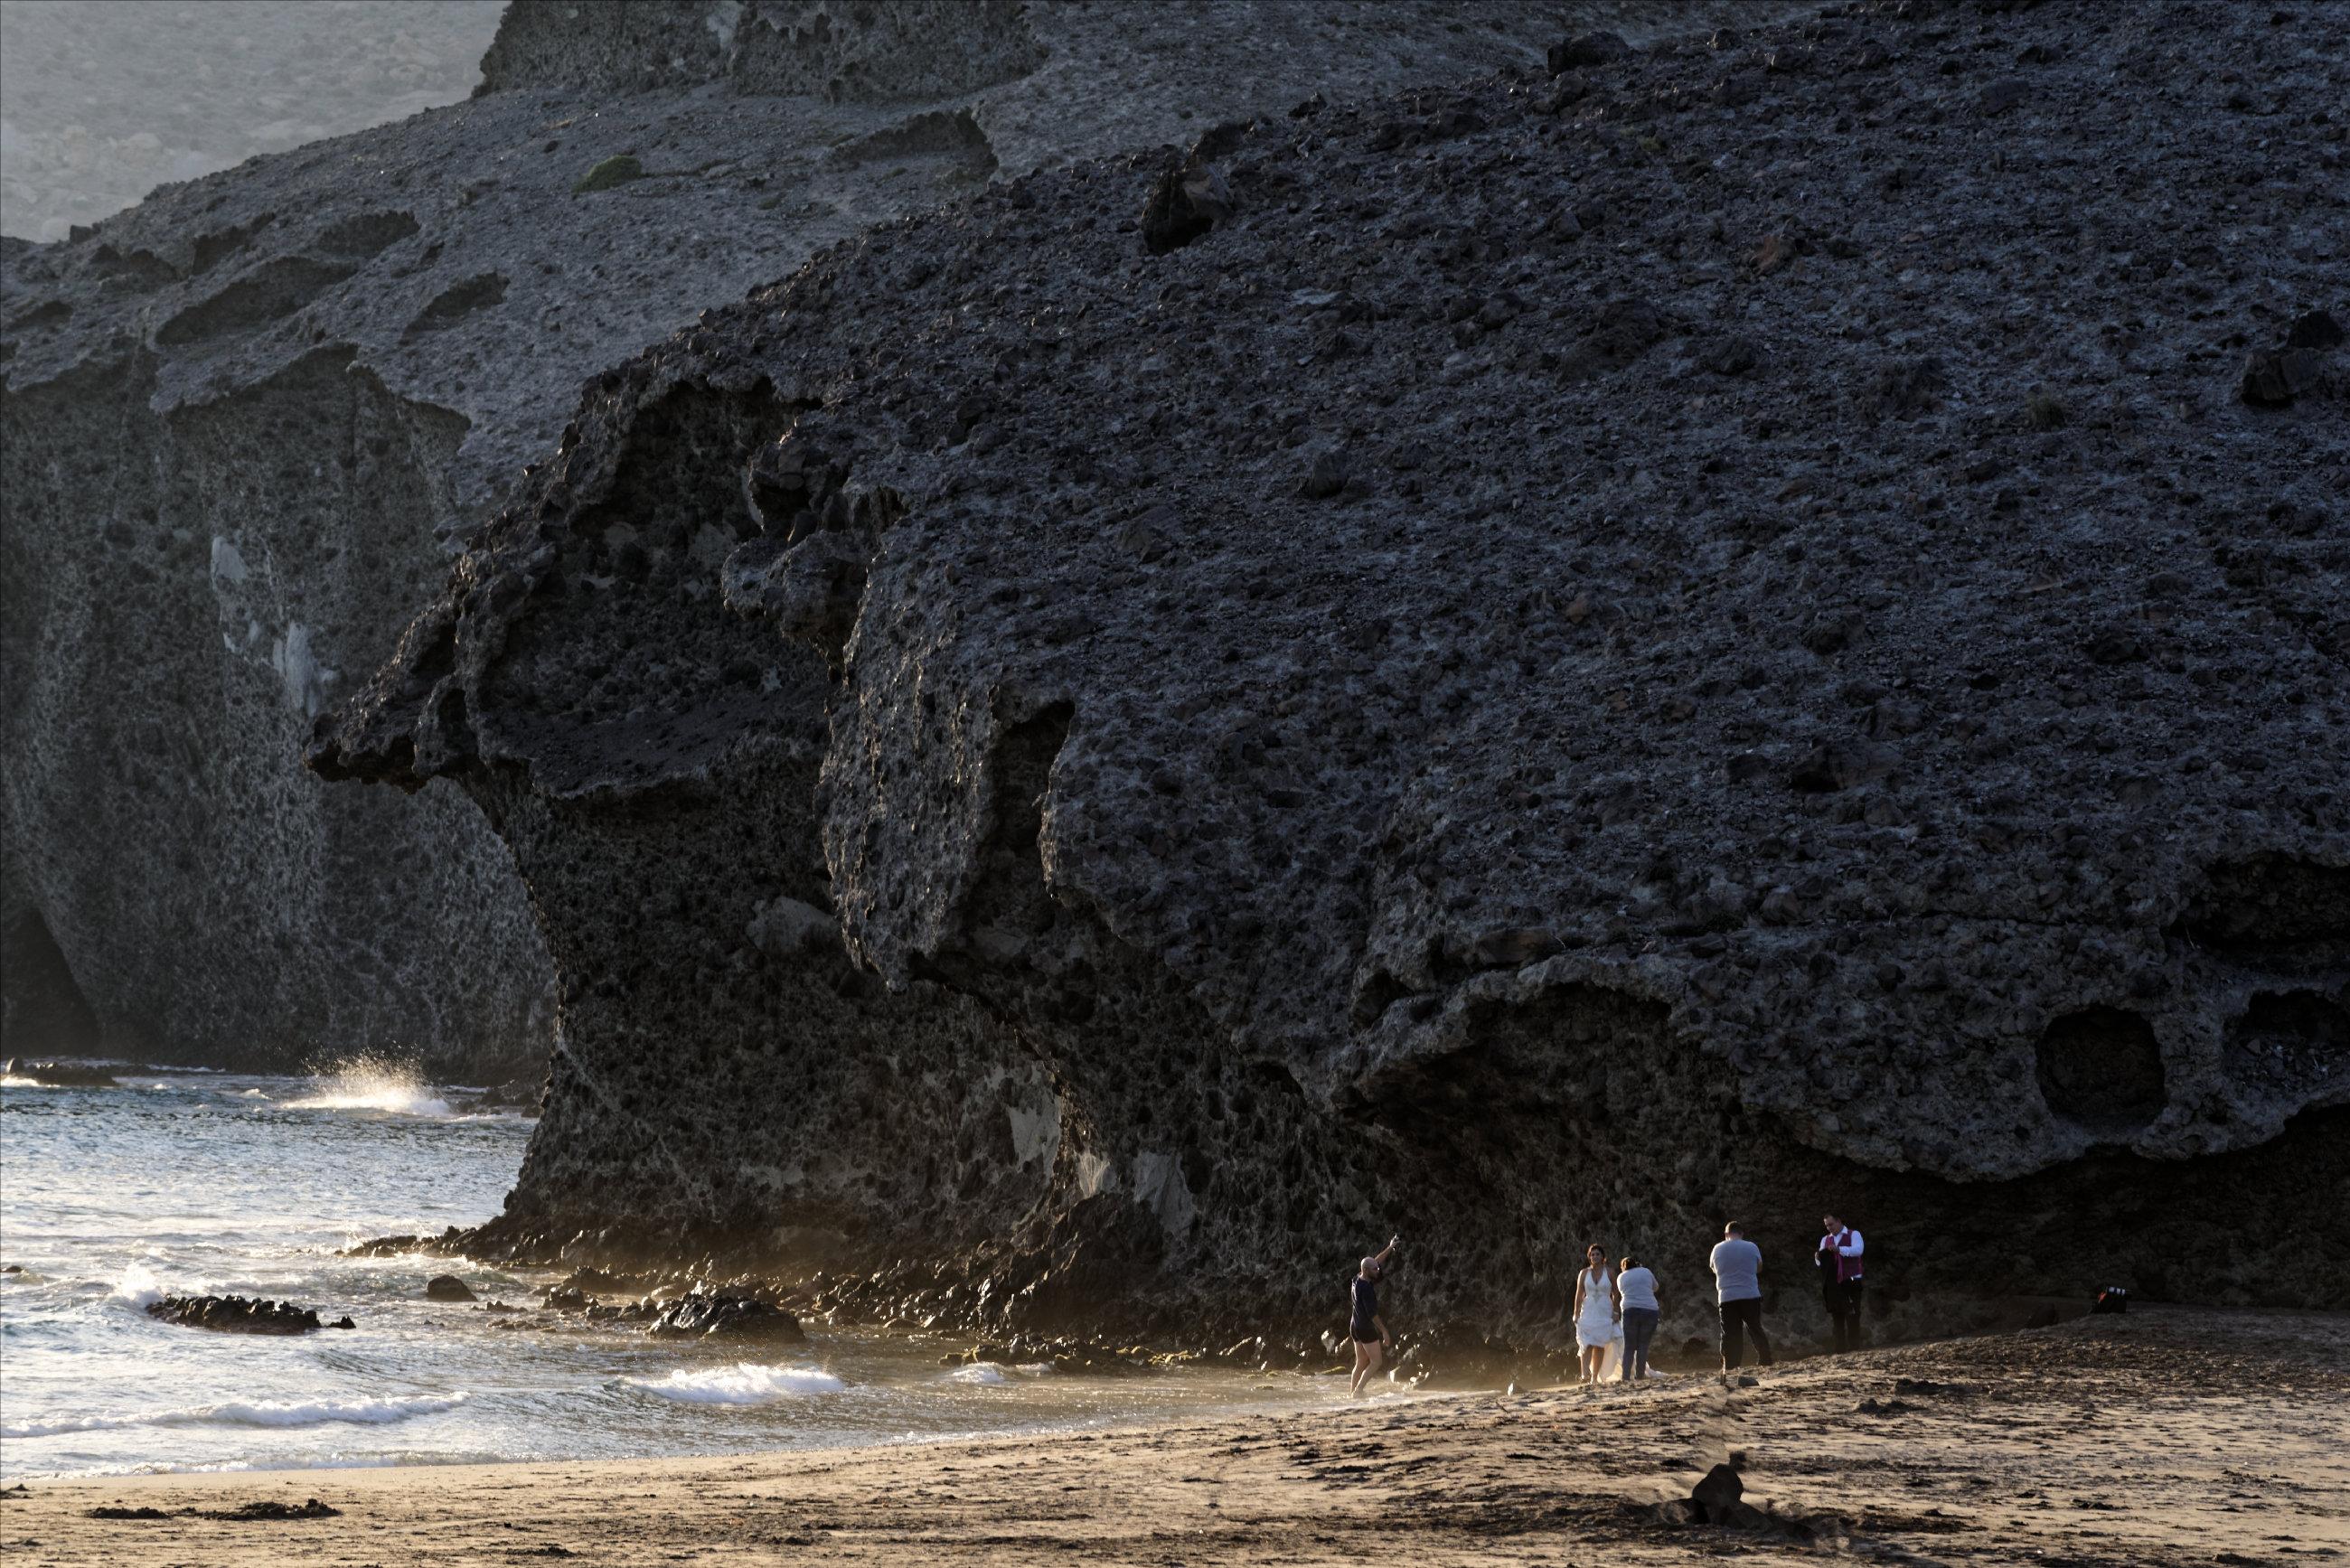 151104-San Jose-Playa de Monsul (38)